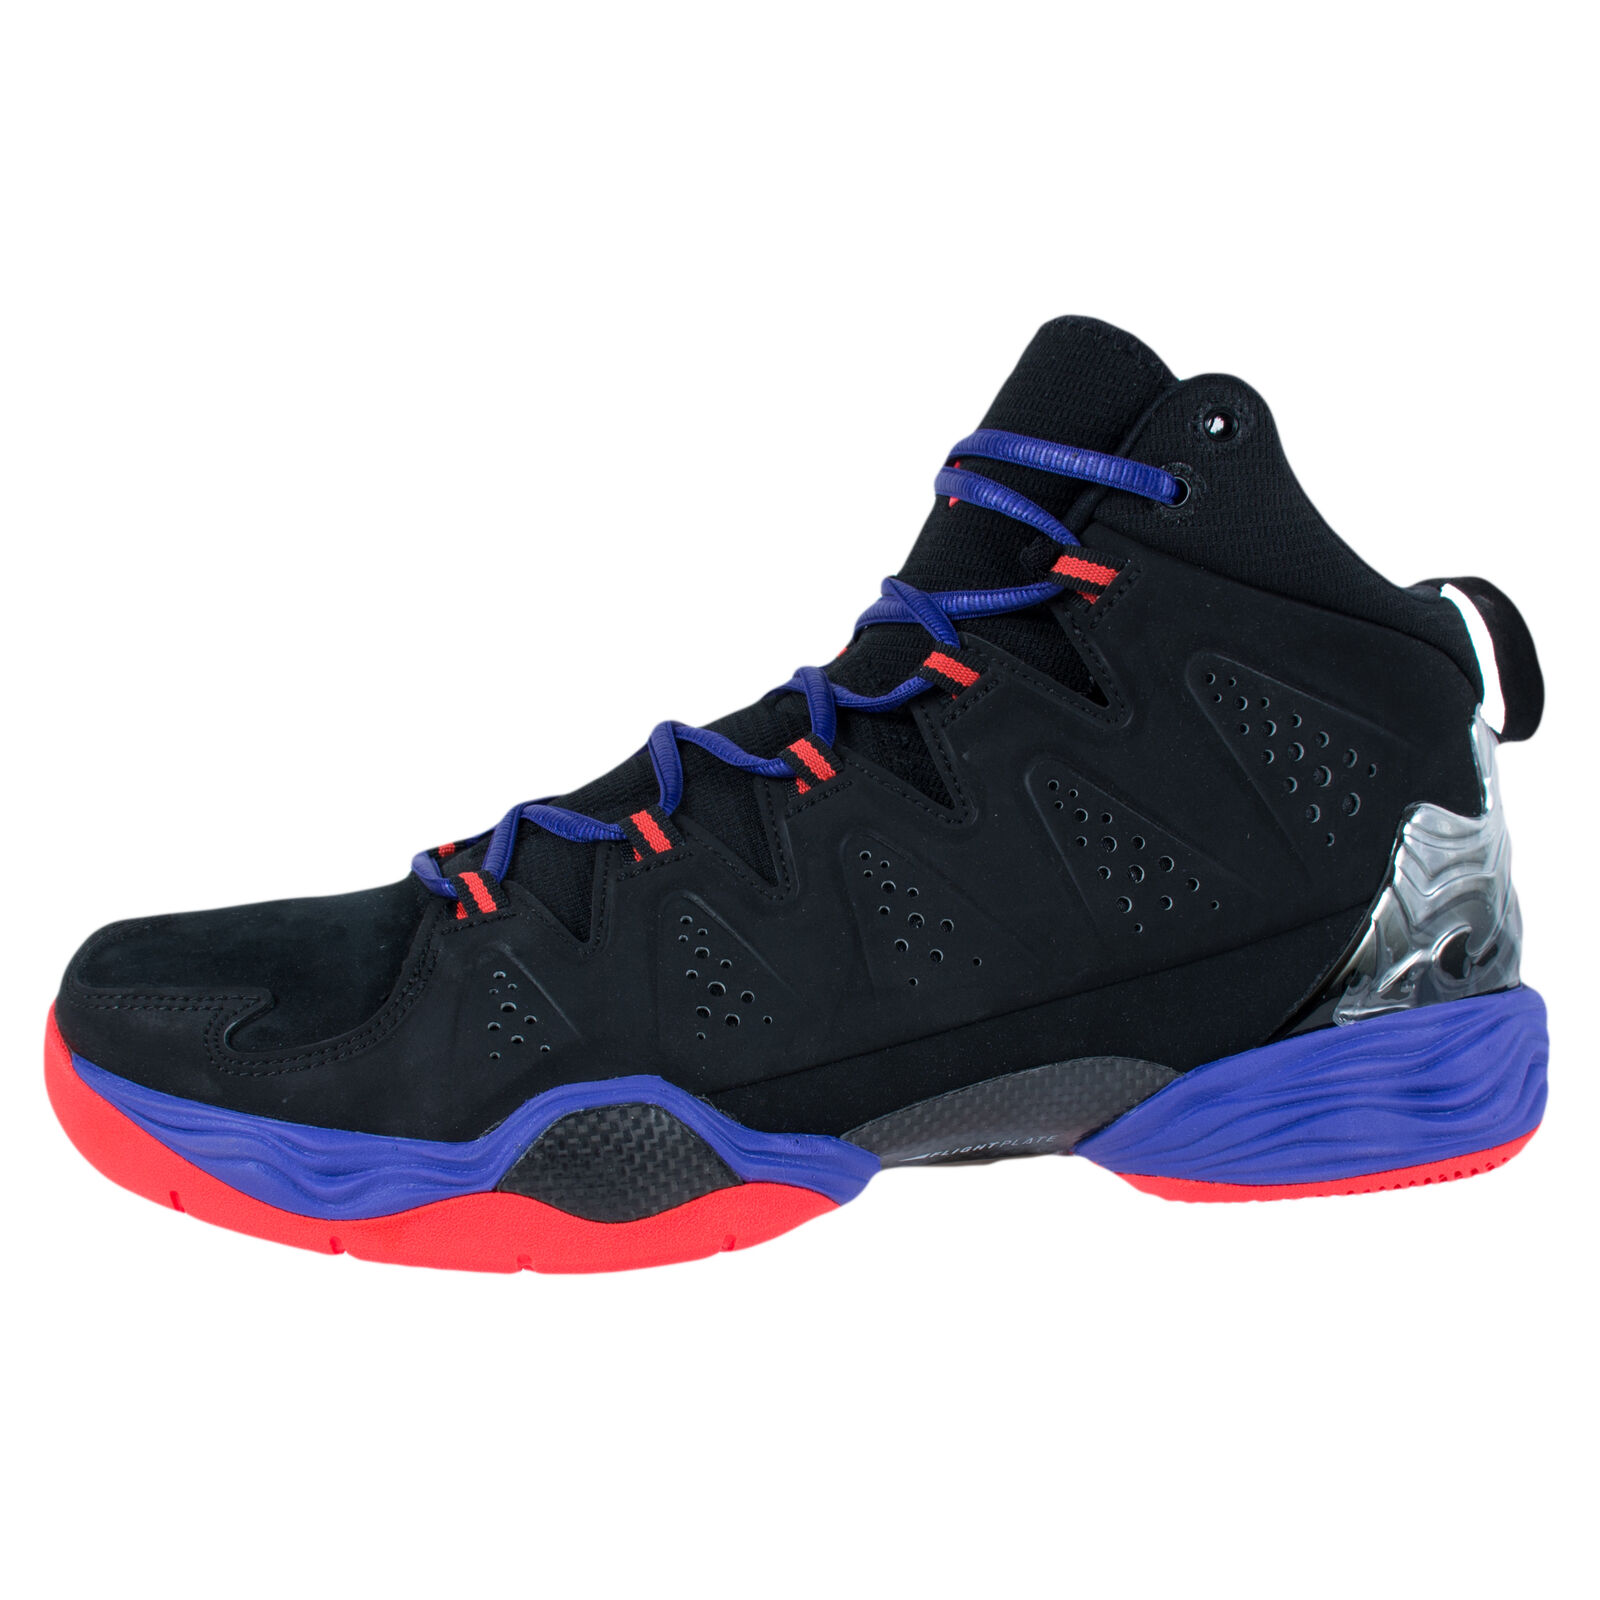 Jordan Melo M10 Men's Basketball Shoes